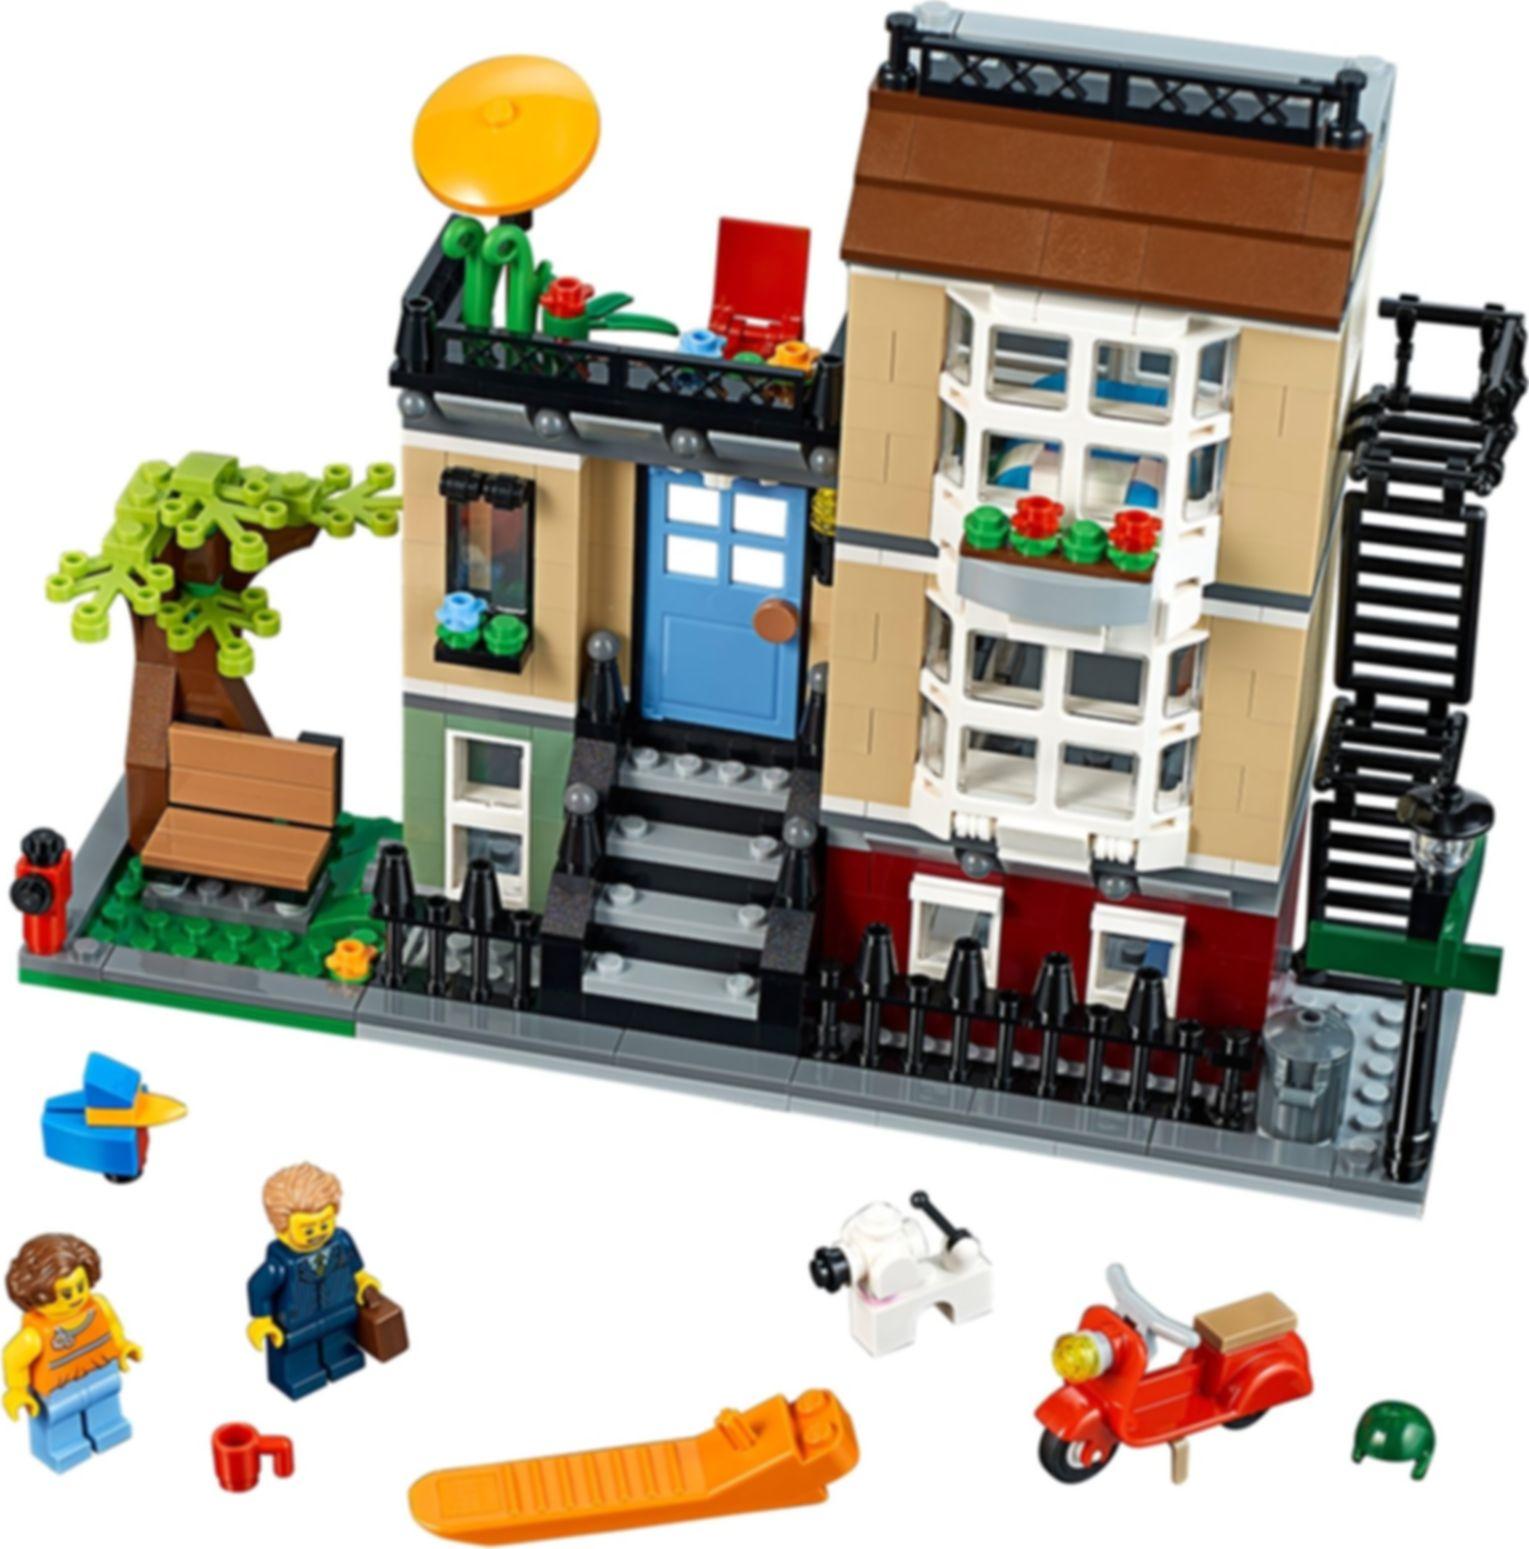 Park Street Townhouse components